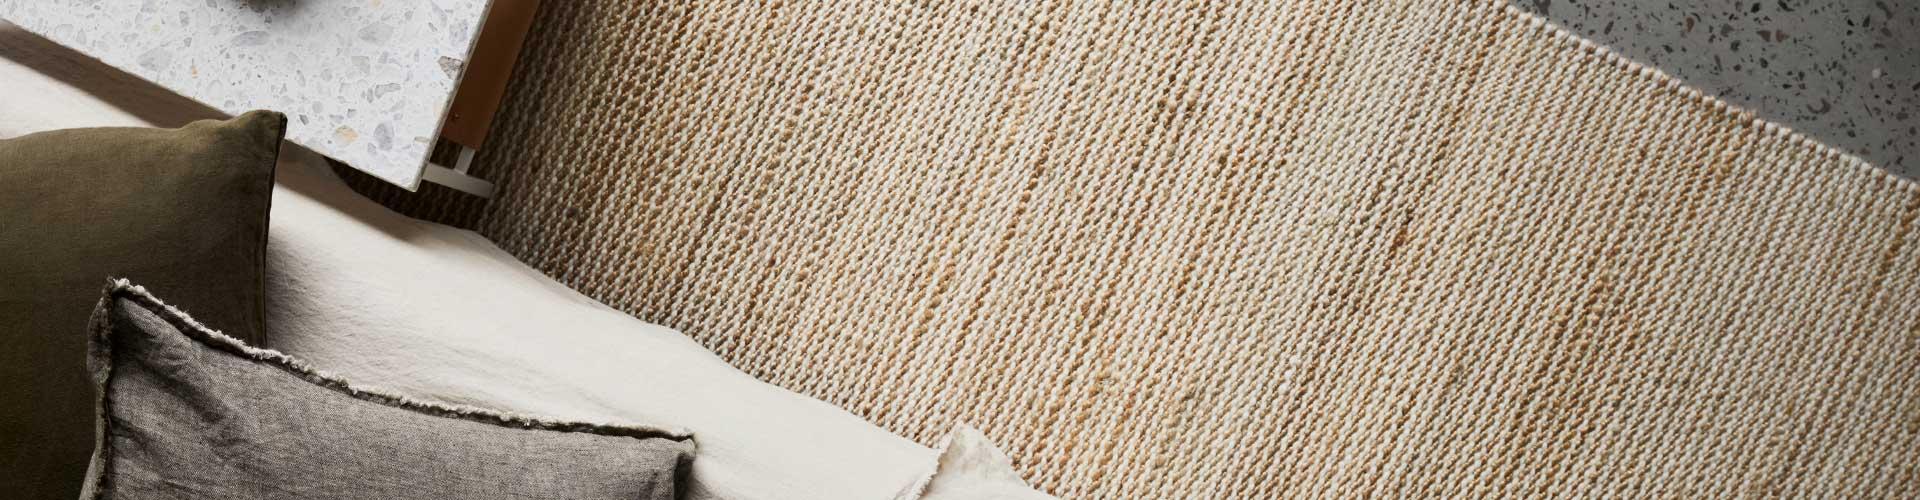 RM Living Cincinnati Contemporary Interior Floor Coverings and Rugs by Armadillo Armadillo9